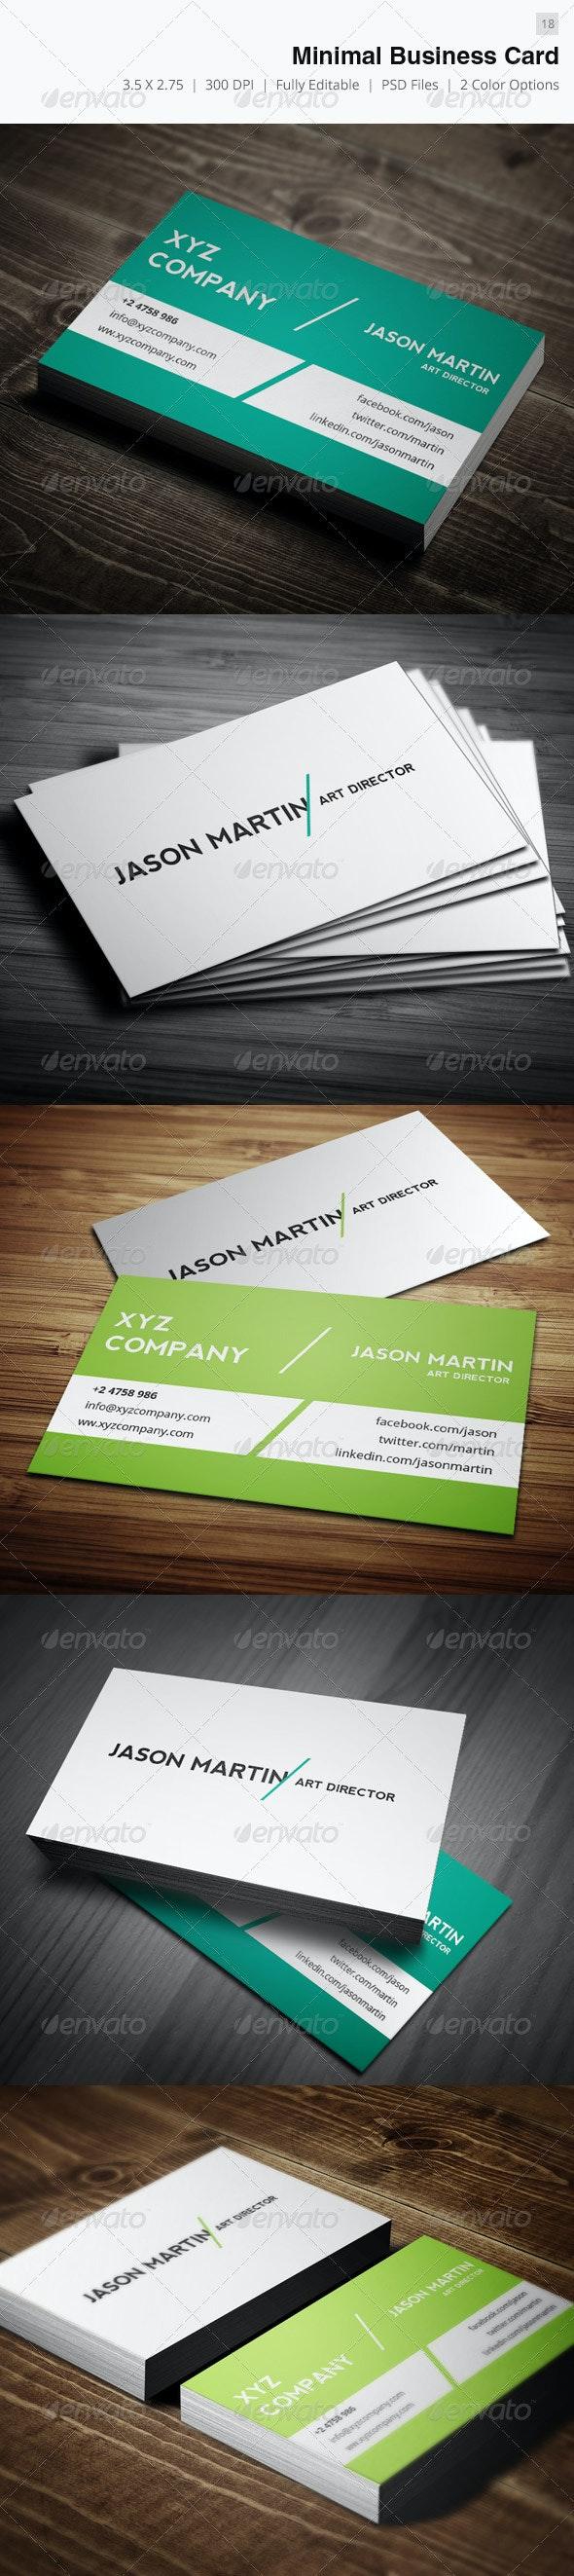 Minimal Business Card - 18 - Creative Business Cards